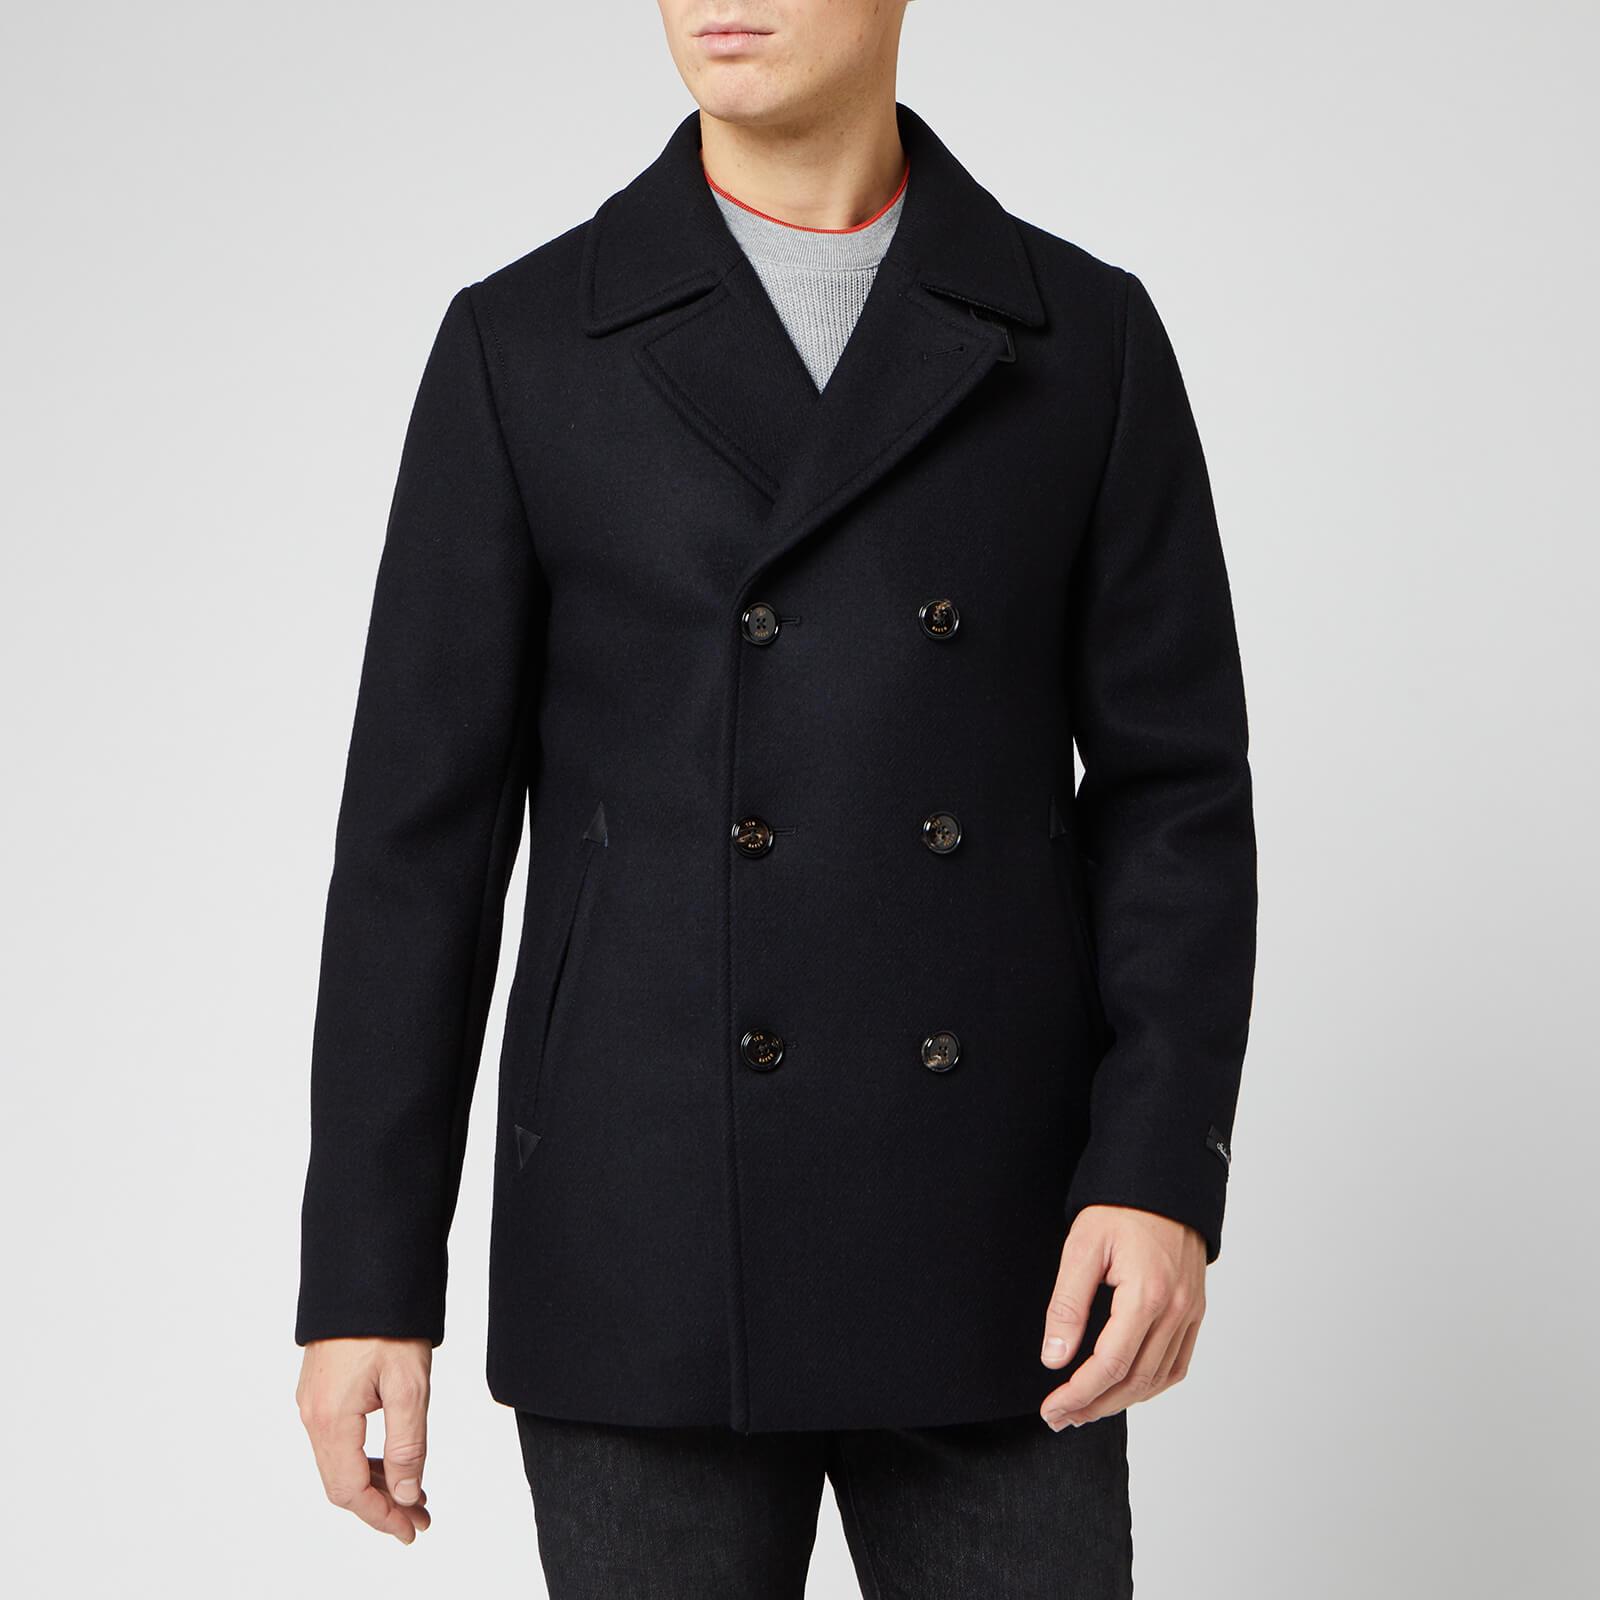 Ted Baker Men's Westun Wool Peacoat - Navy - XL/5